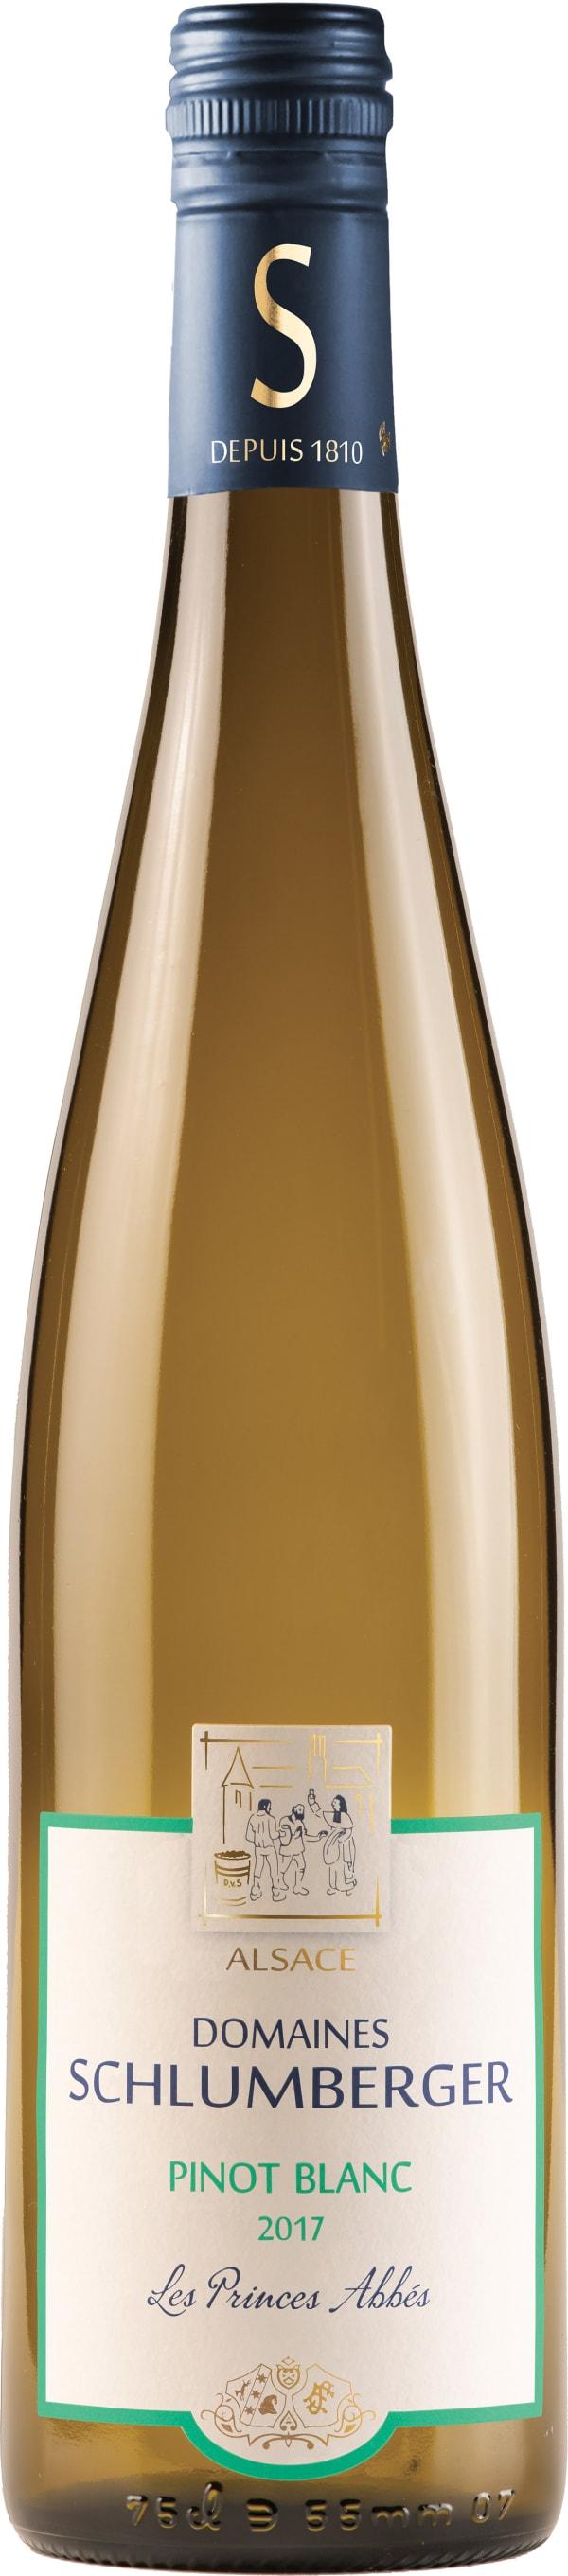 Domaines Schlumberger Pinot Blanc Les Princes Abbés 2014